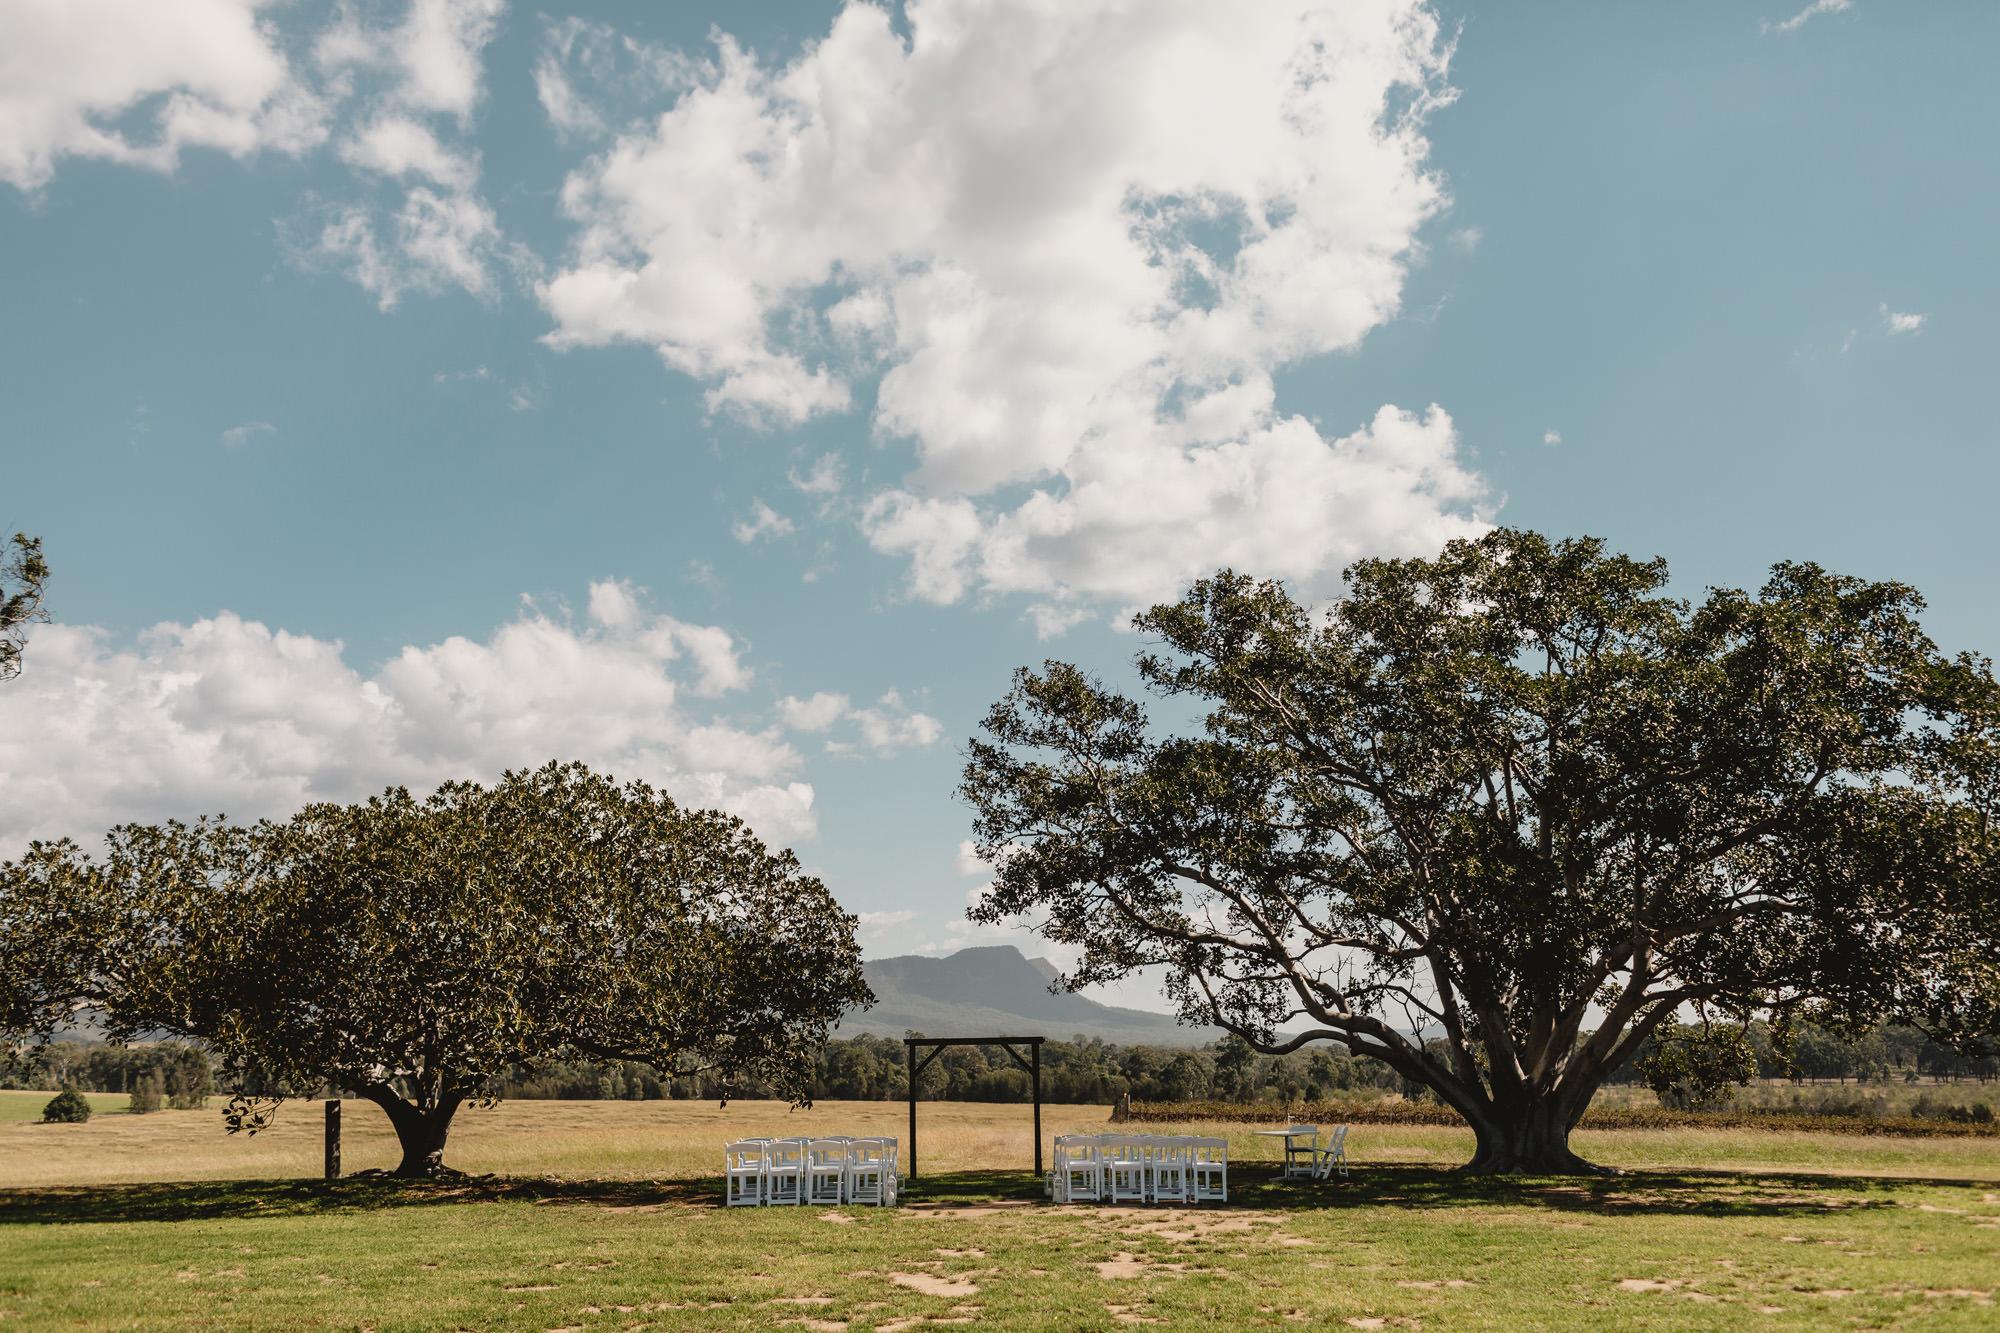 Outdoor ceremony set up at bimbadgen palmers lane wedding venue